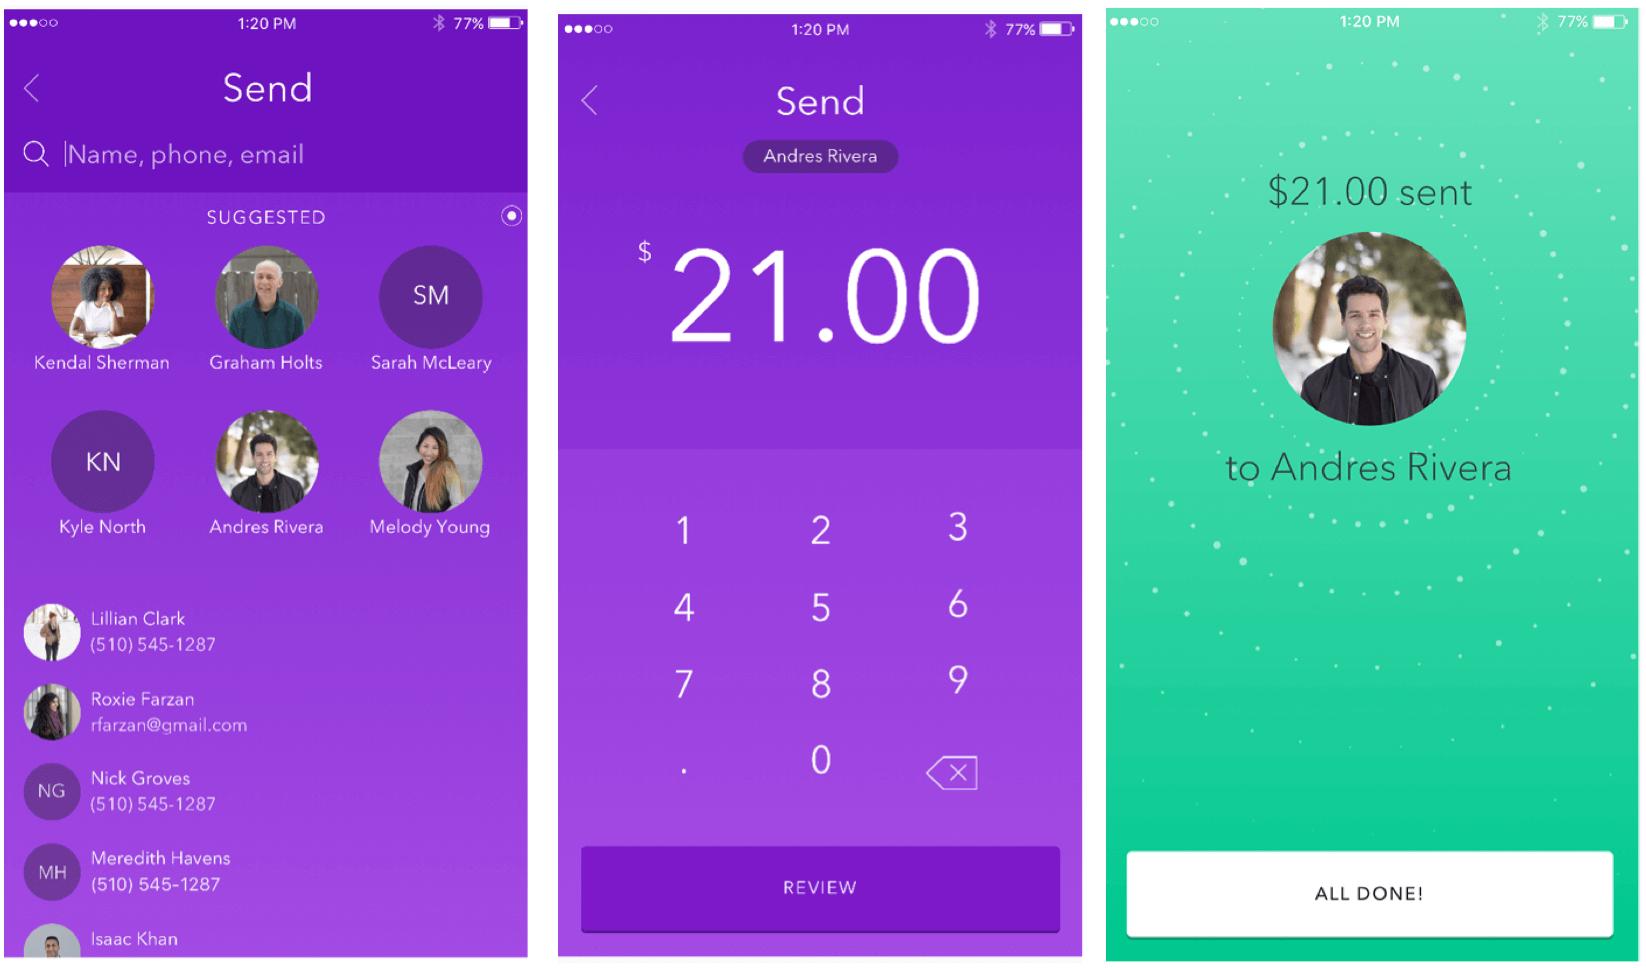 Send Money With Zelle send money